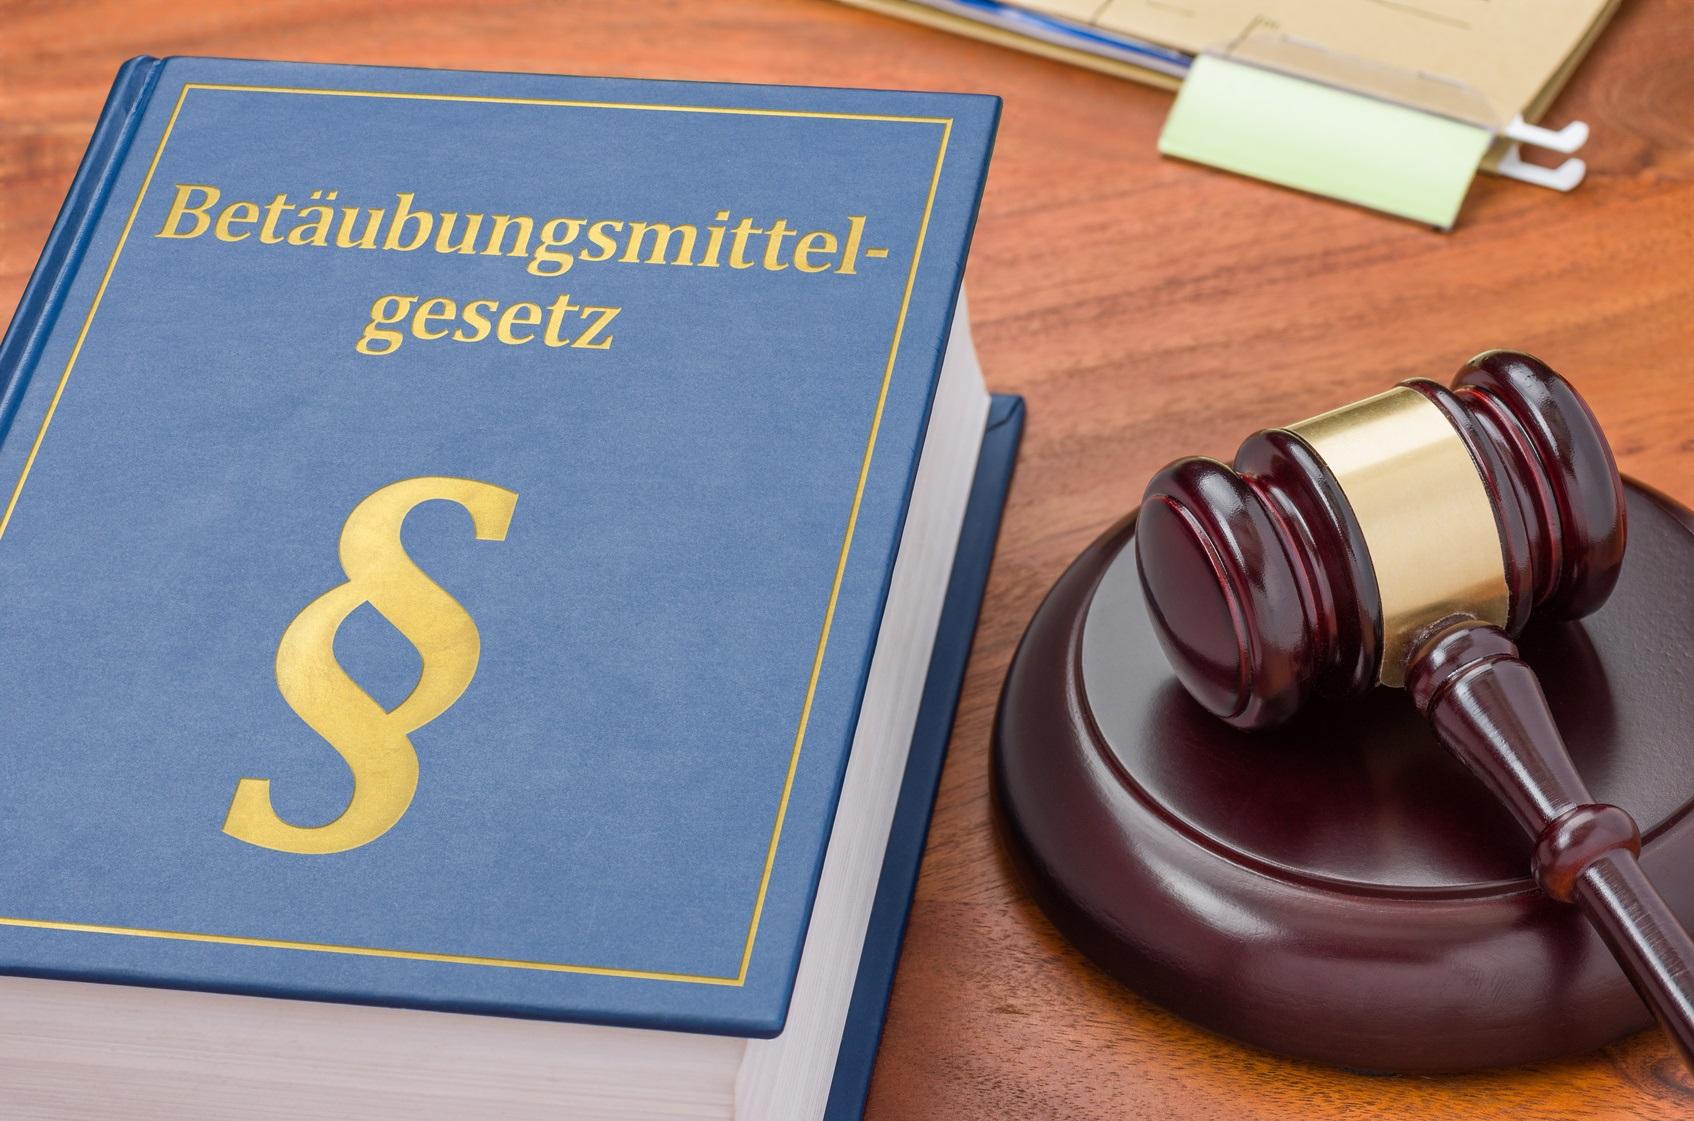 Rechtsanwalt Clemens Louis Kosten BtM Verfahren